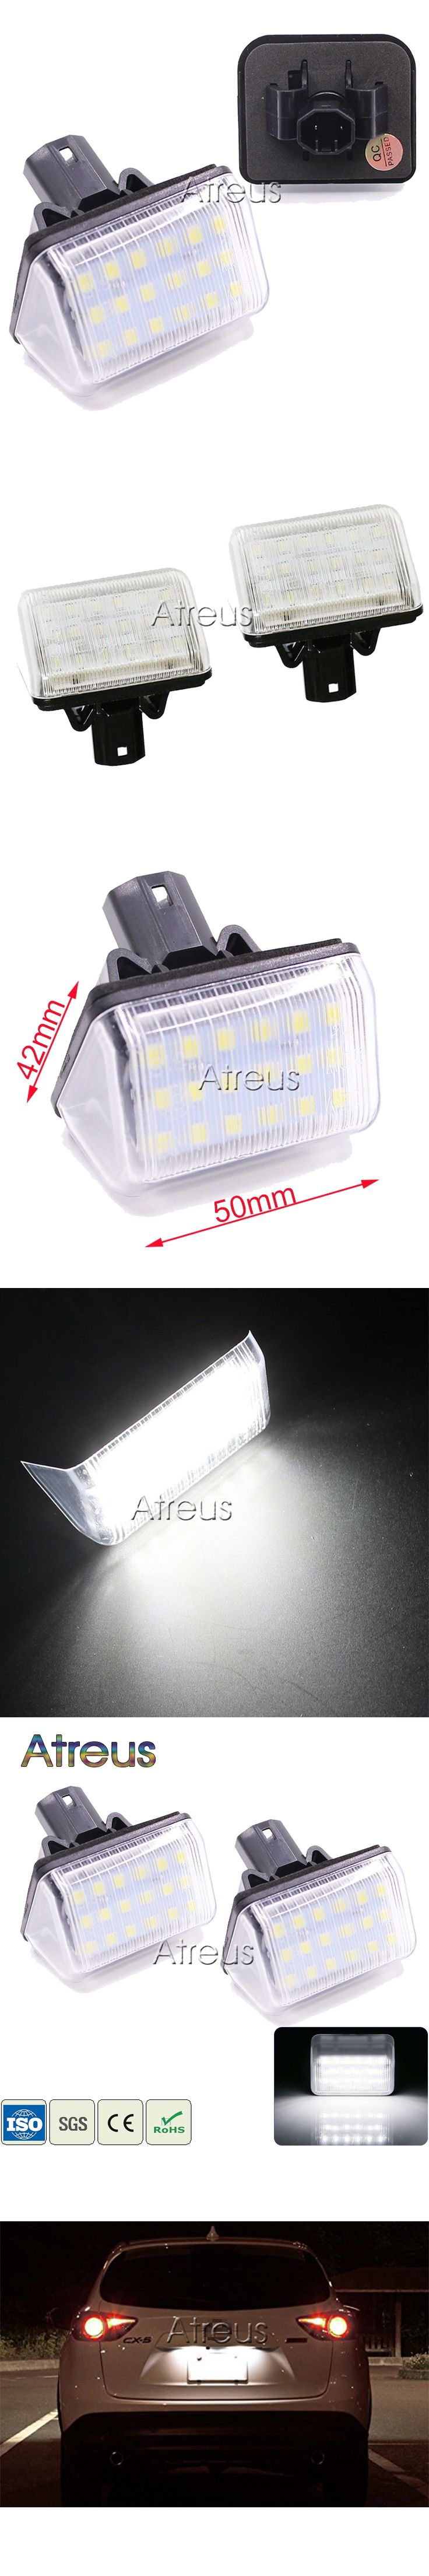 Atreus Car LED License Plate Lights 12V For Mazda 6 03- CX-5 14- CX-7 07- Accessories White SMD LED Number Plate Lamp Bulb Kit